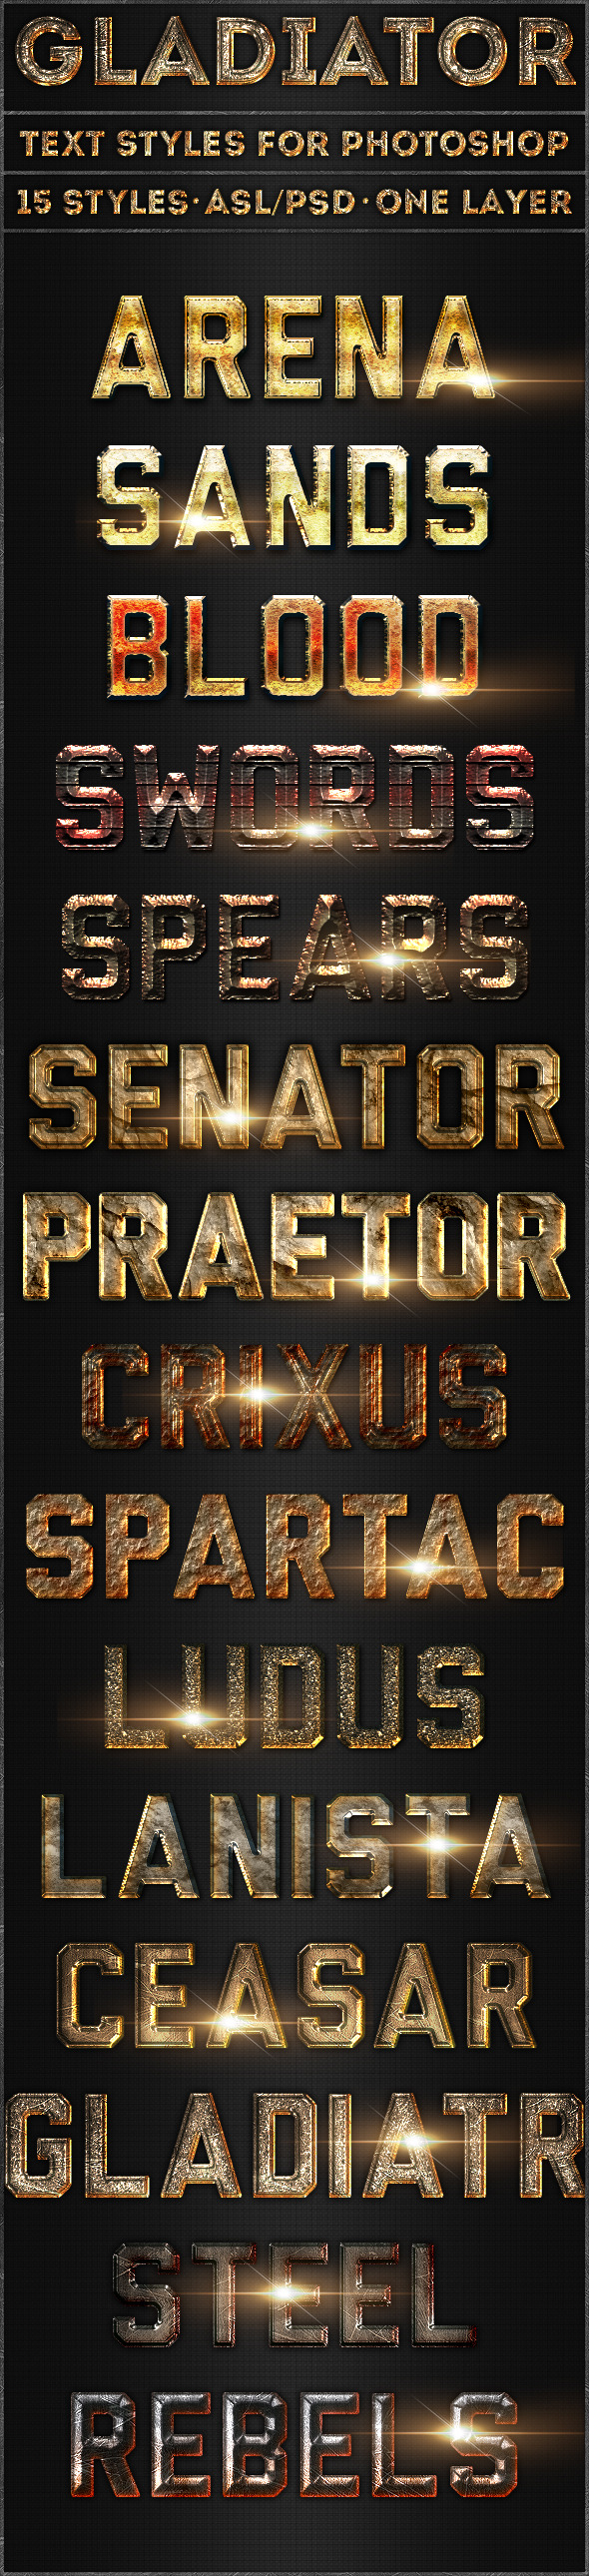 Gladiator - Text Styles